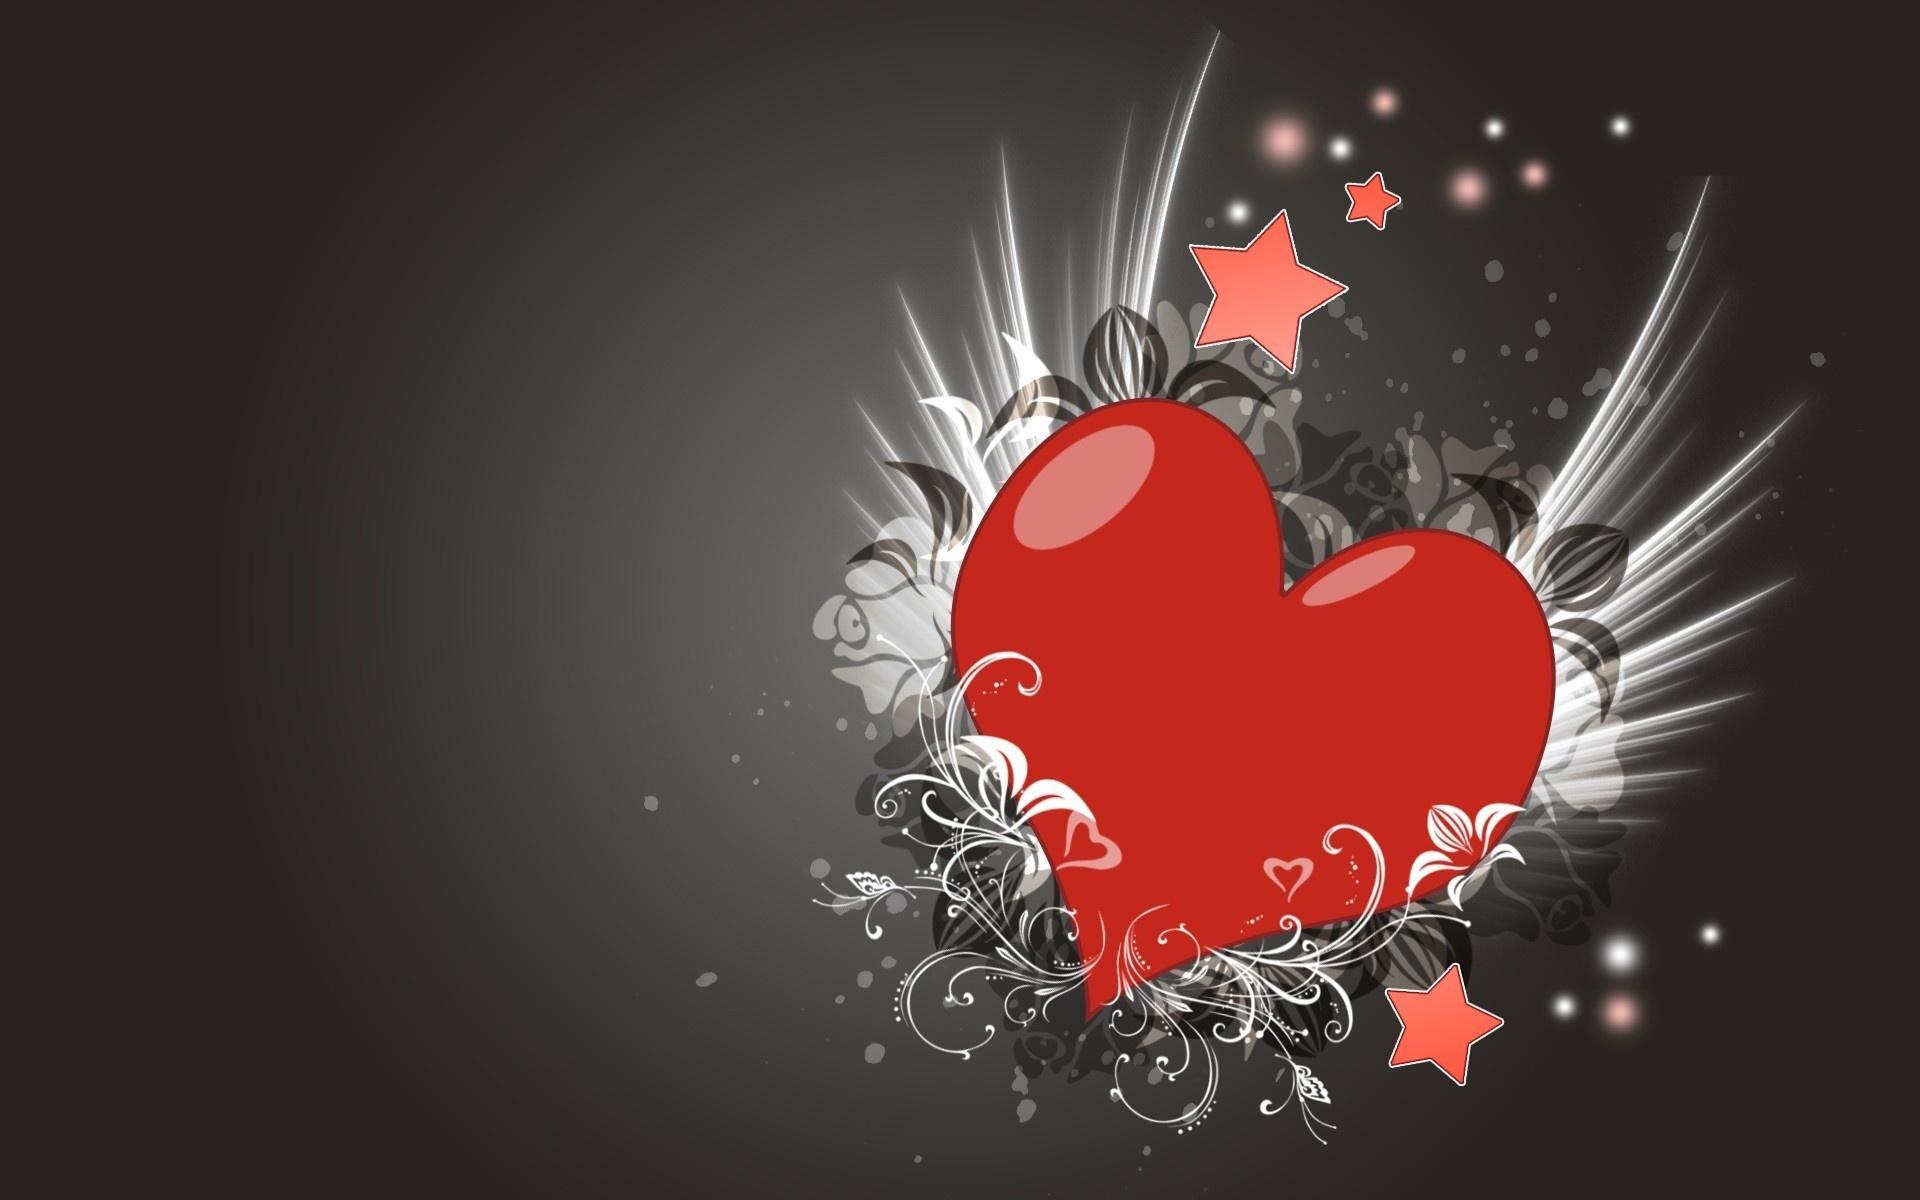 قلوب بالصور (1)